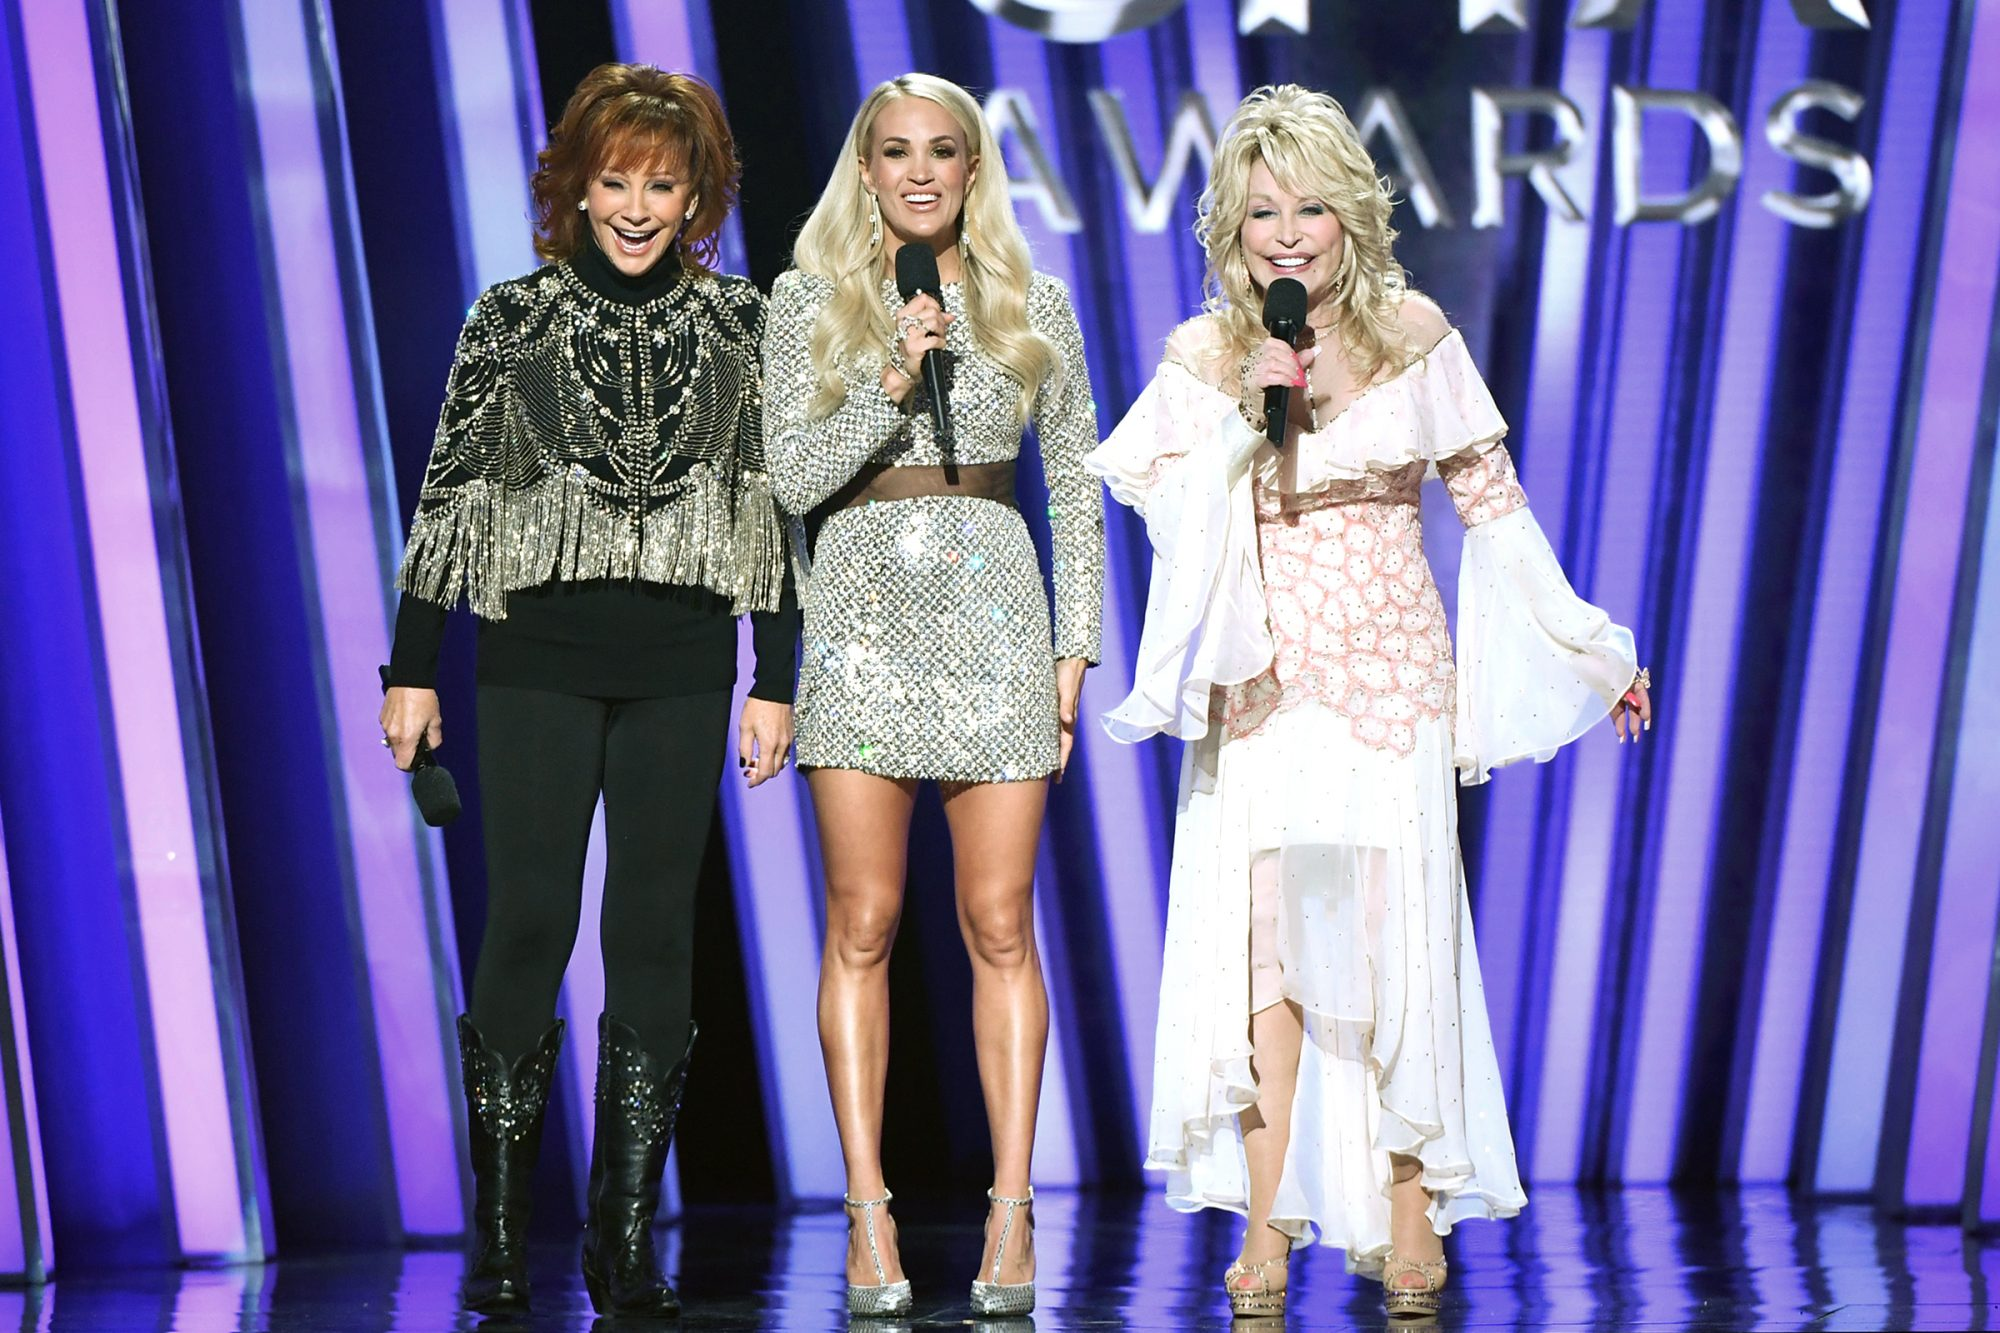 Reba McEntire; Carrie Underwood; Dolly Parton